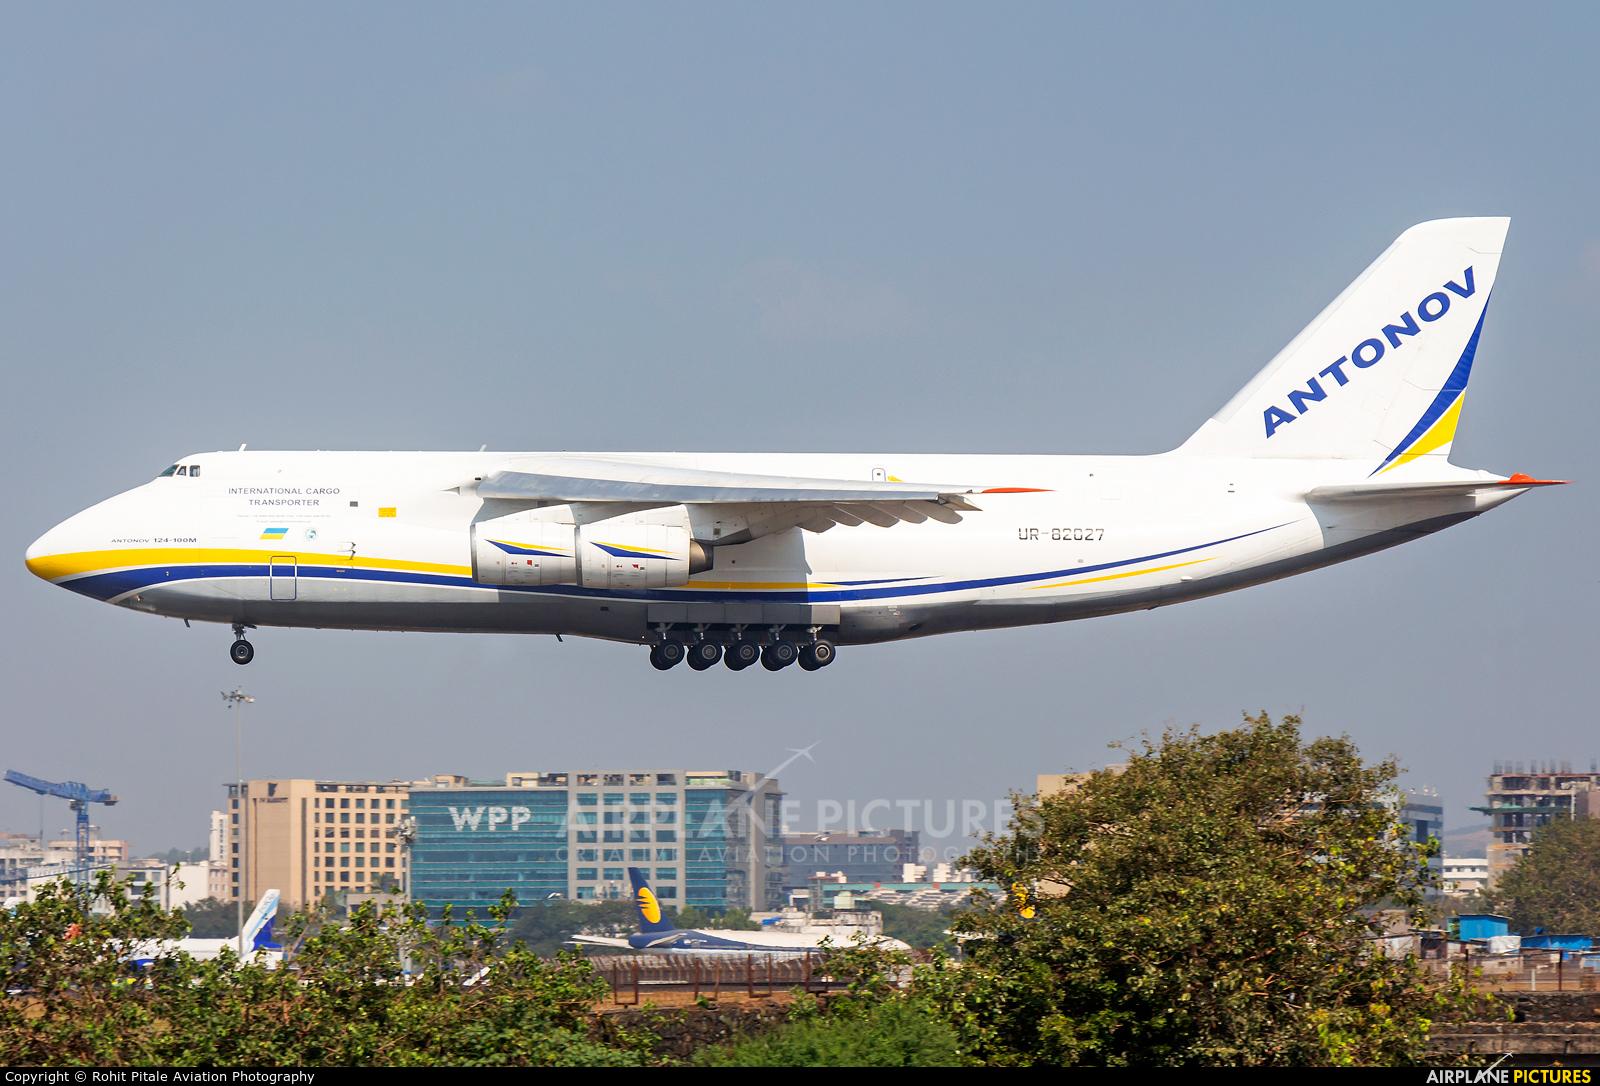 Antonov Airlines /  Design Bureau UR-82027 aircraft at Mumbai - Chhatrapati Shivaji Intl